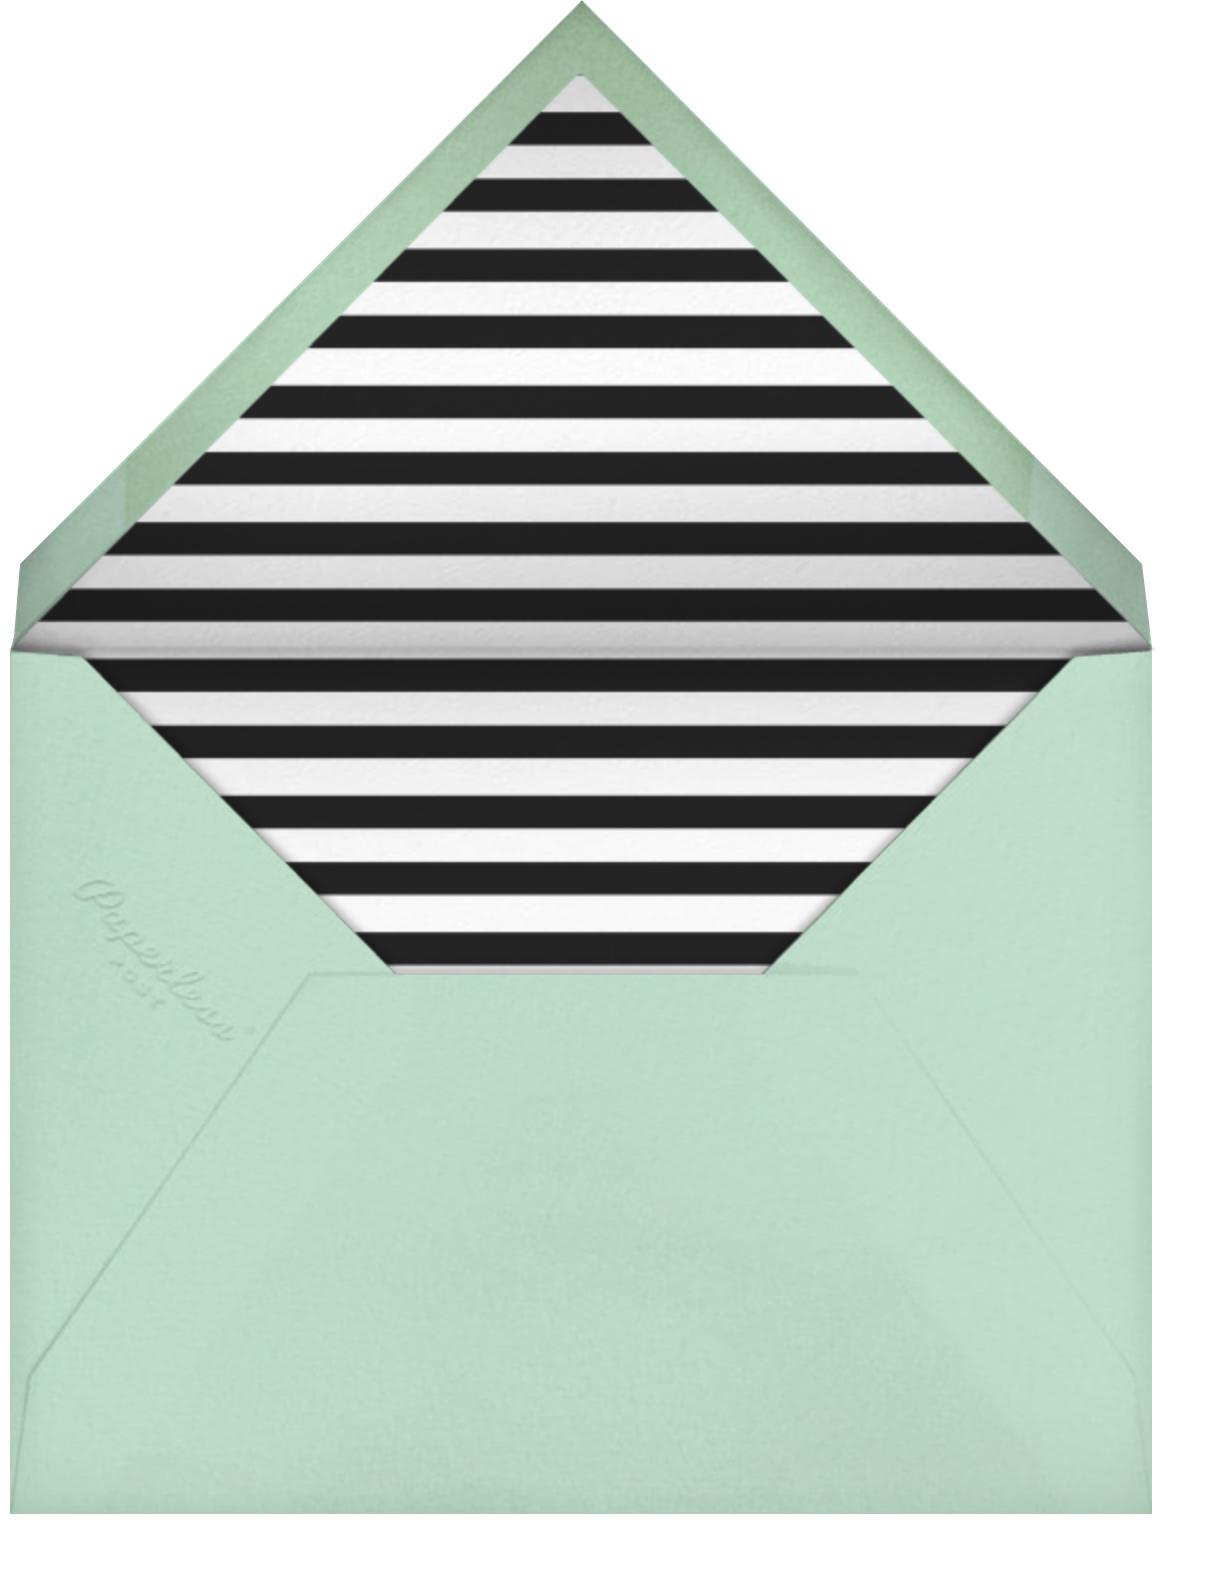 Decade Photo (Seventy) - Black - Paperless Post - Adult birthday - envelope back